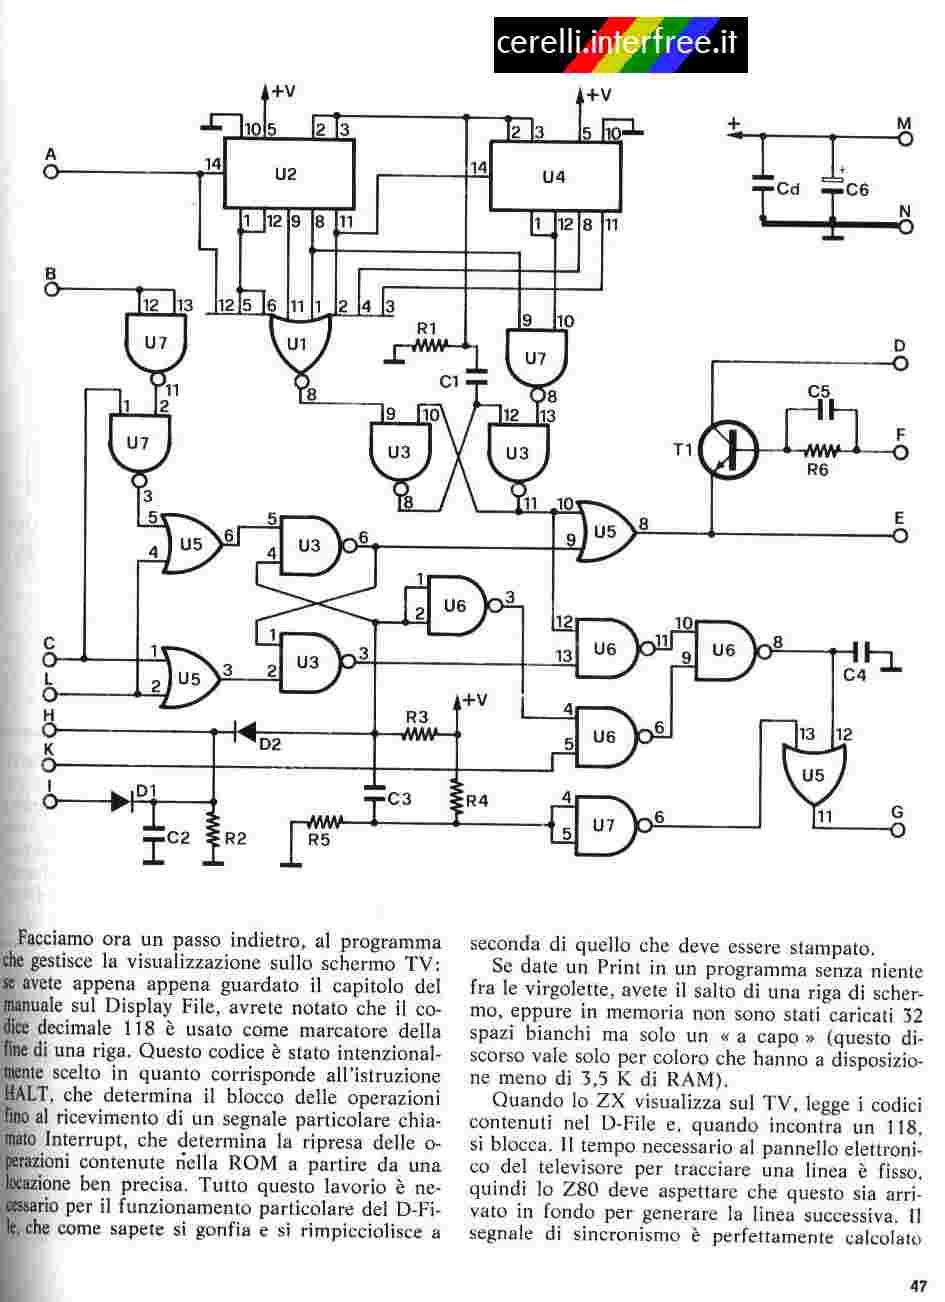 Zx80 Slow Built Zx81 Circuit Diagram Rozen O Reim S Nmi Aneb Jak Postavit Ze Zkladnch Logickch Obvod Bez Pouit Ula Nco Pro N Klon